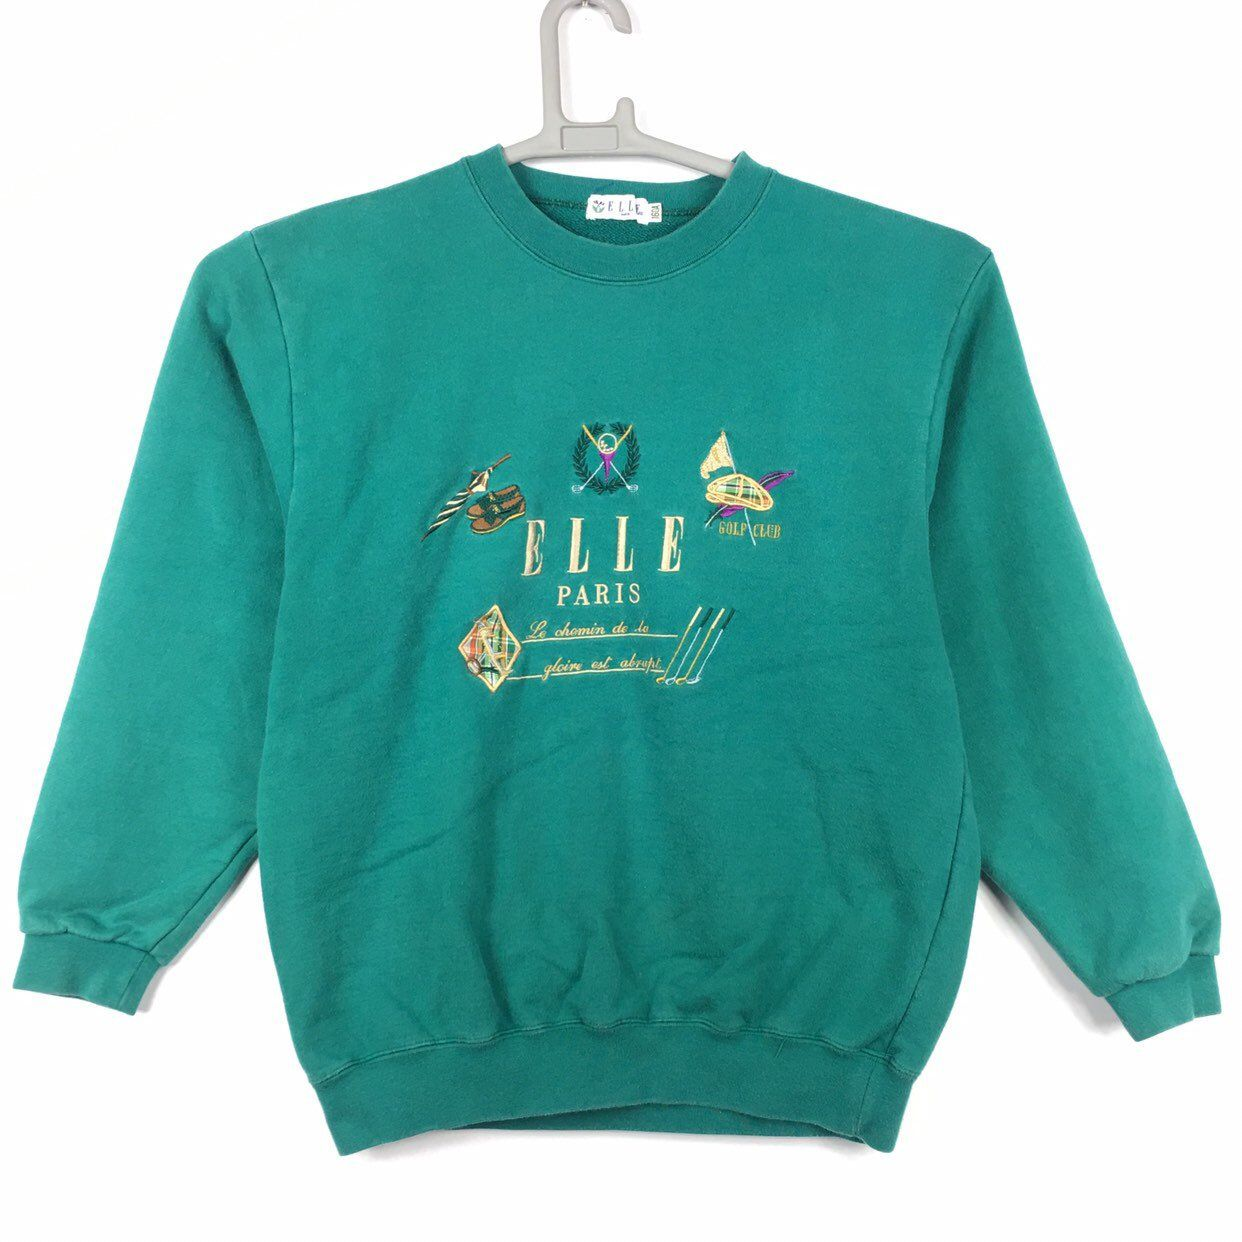 Vintage Elle Paris Women Sweatshirt Etsy Sweatshirts Women Sweatshirts Graphic Sweatshirt [ 1242 x 1242 Pixel ]